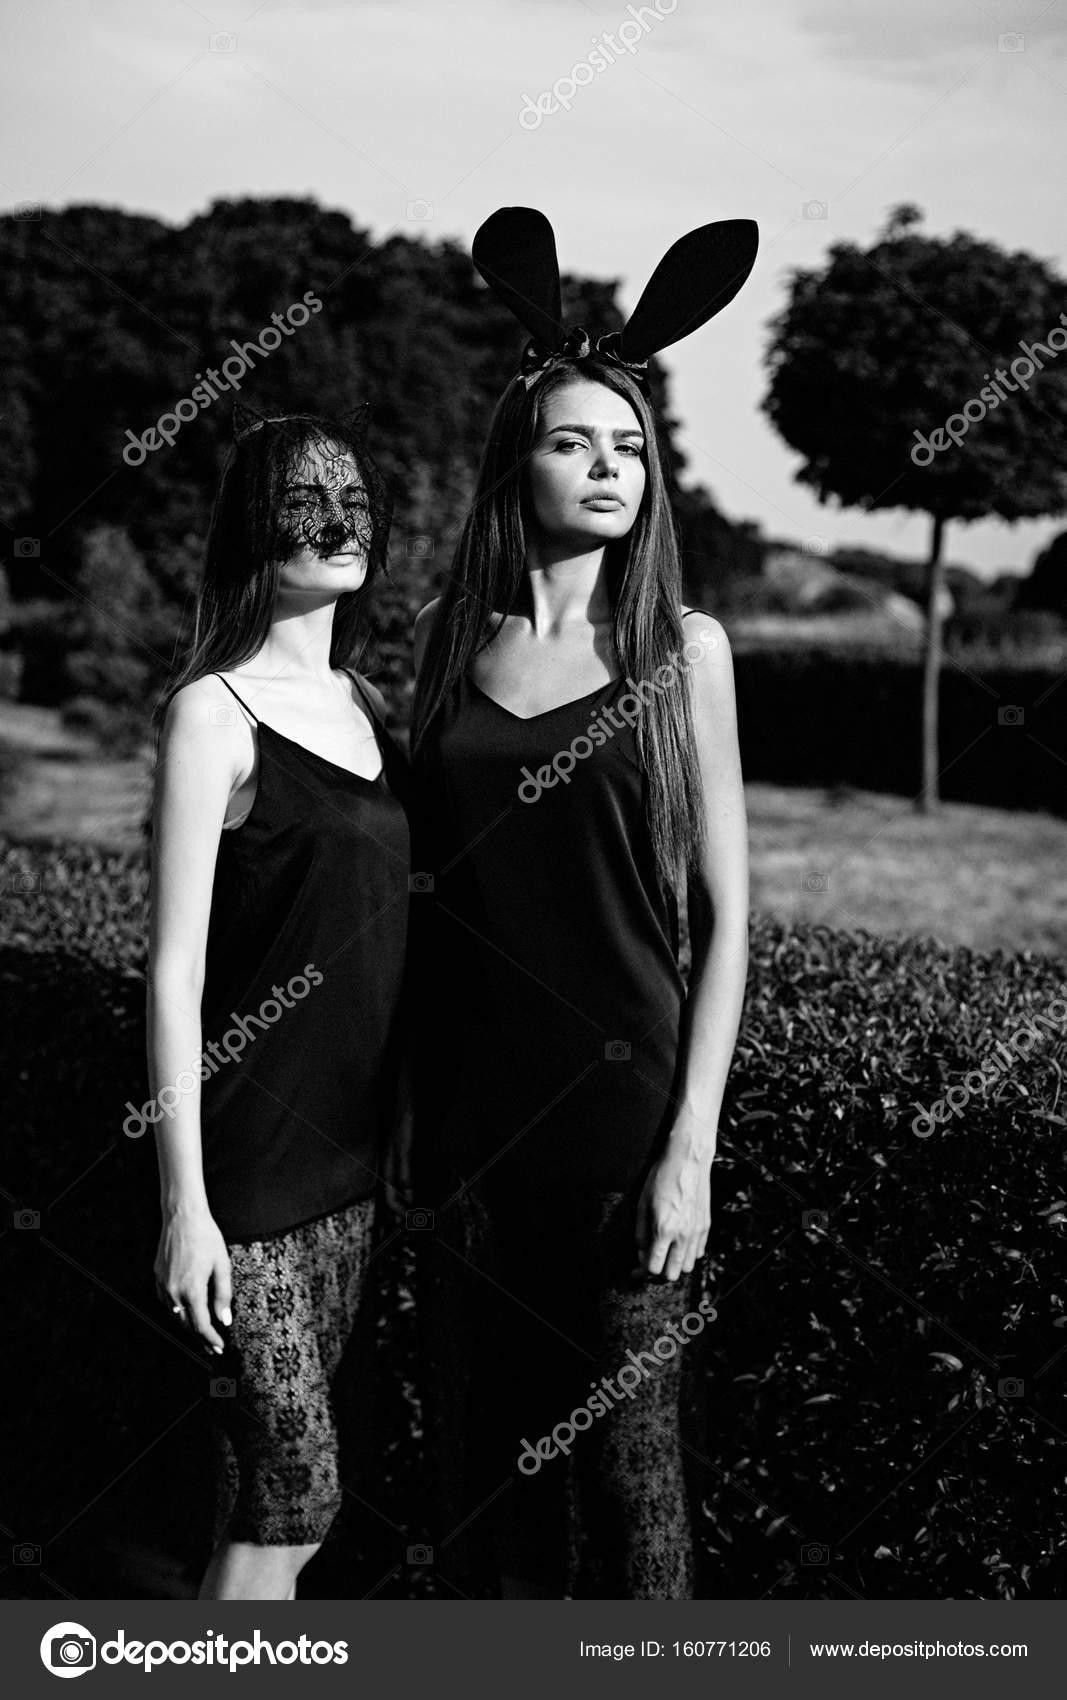 f609510aca6 νεαρές γυναίκες στα μαύρα φορέματα — Φωτογραφία Αρχείου ...